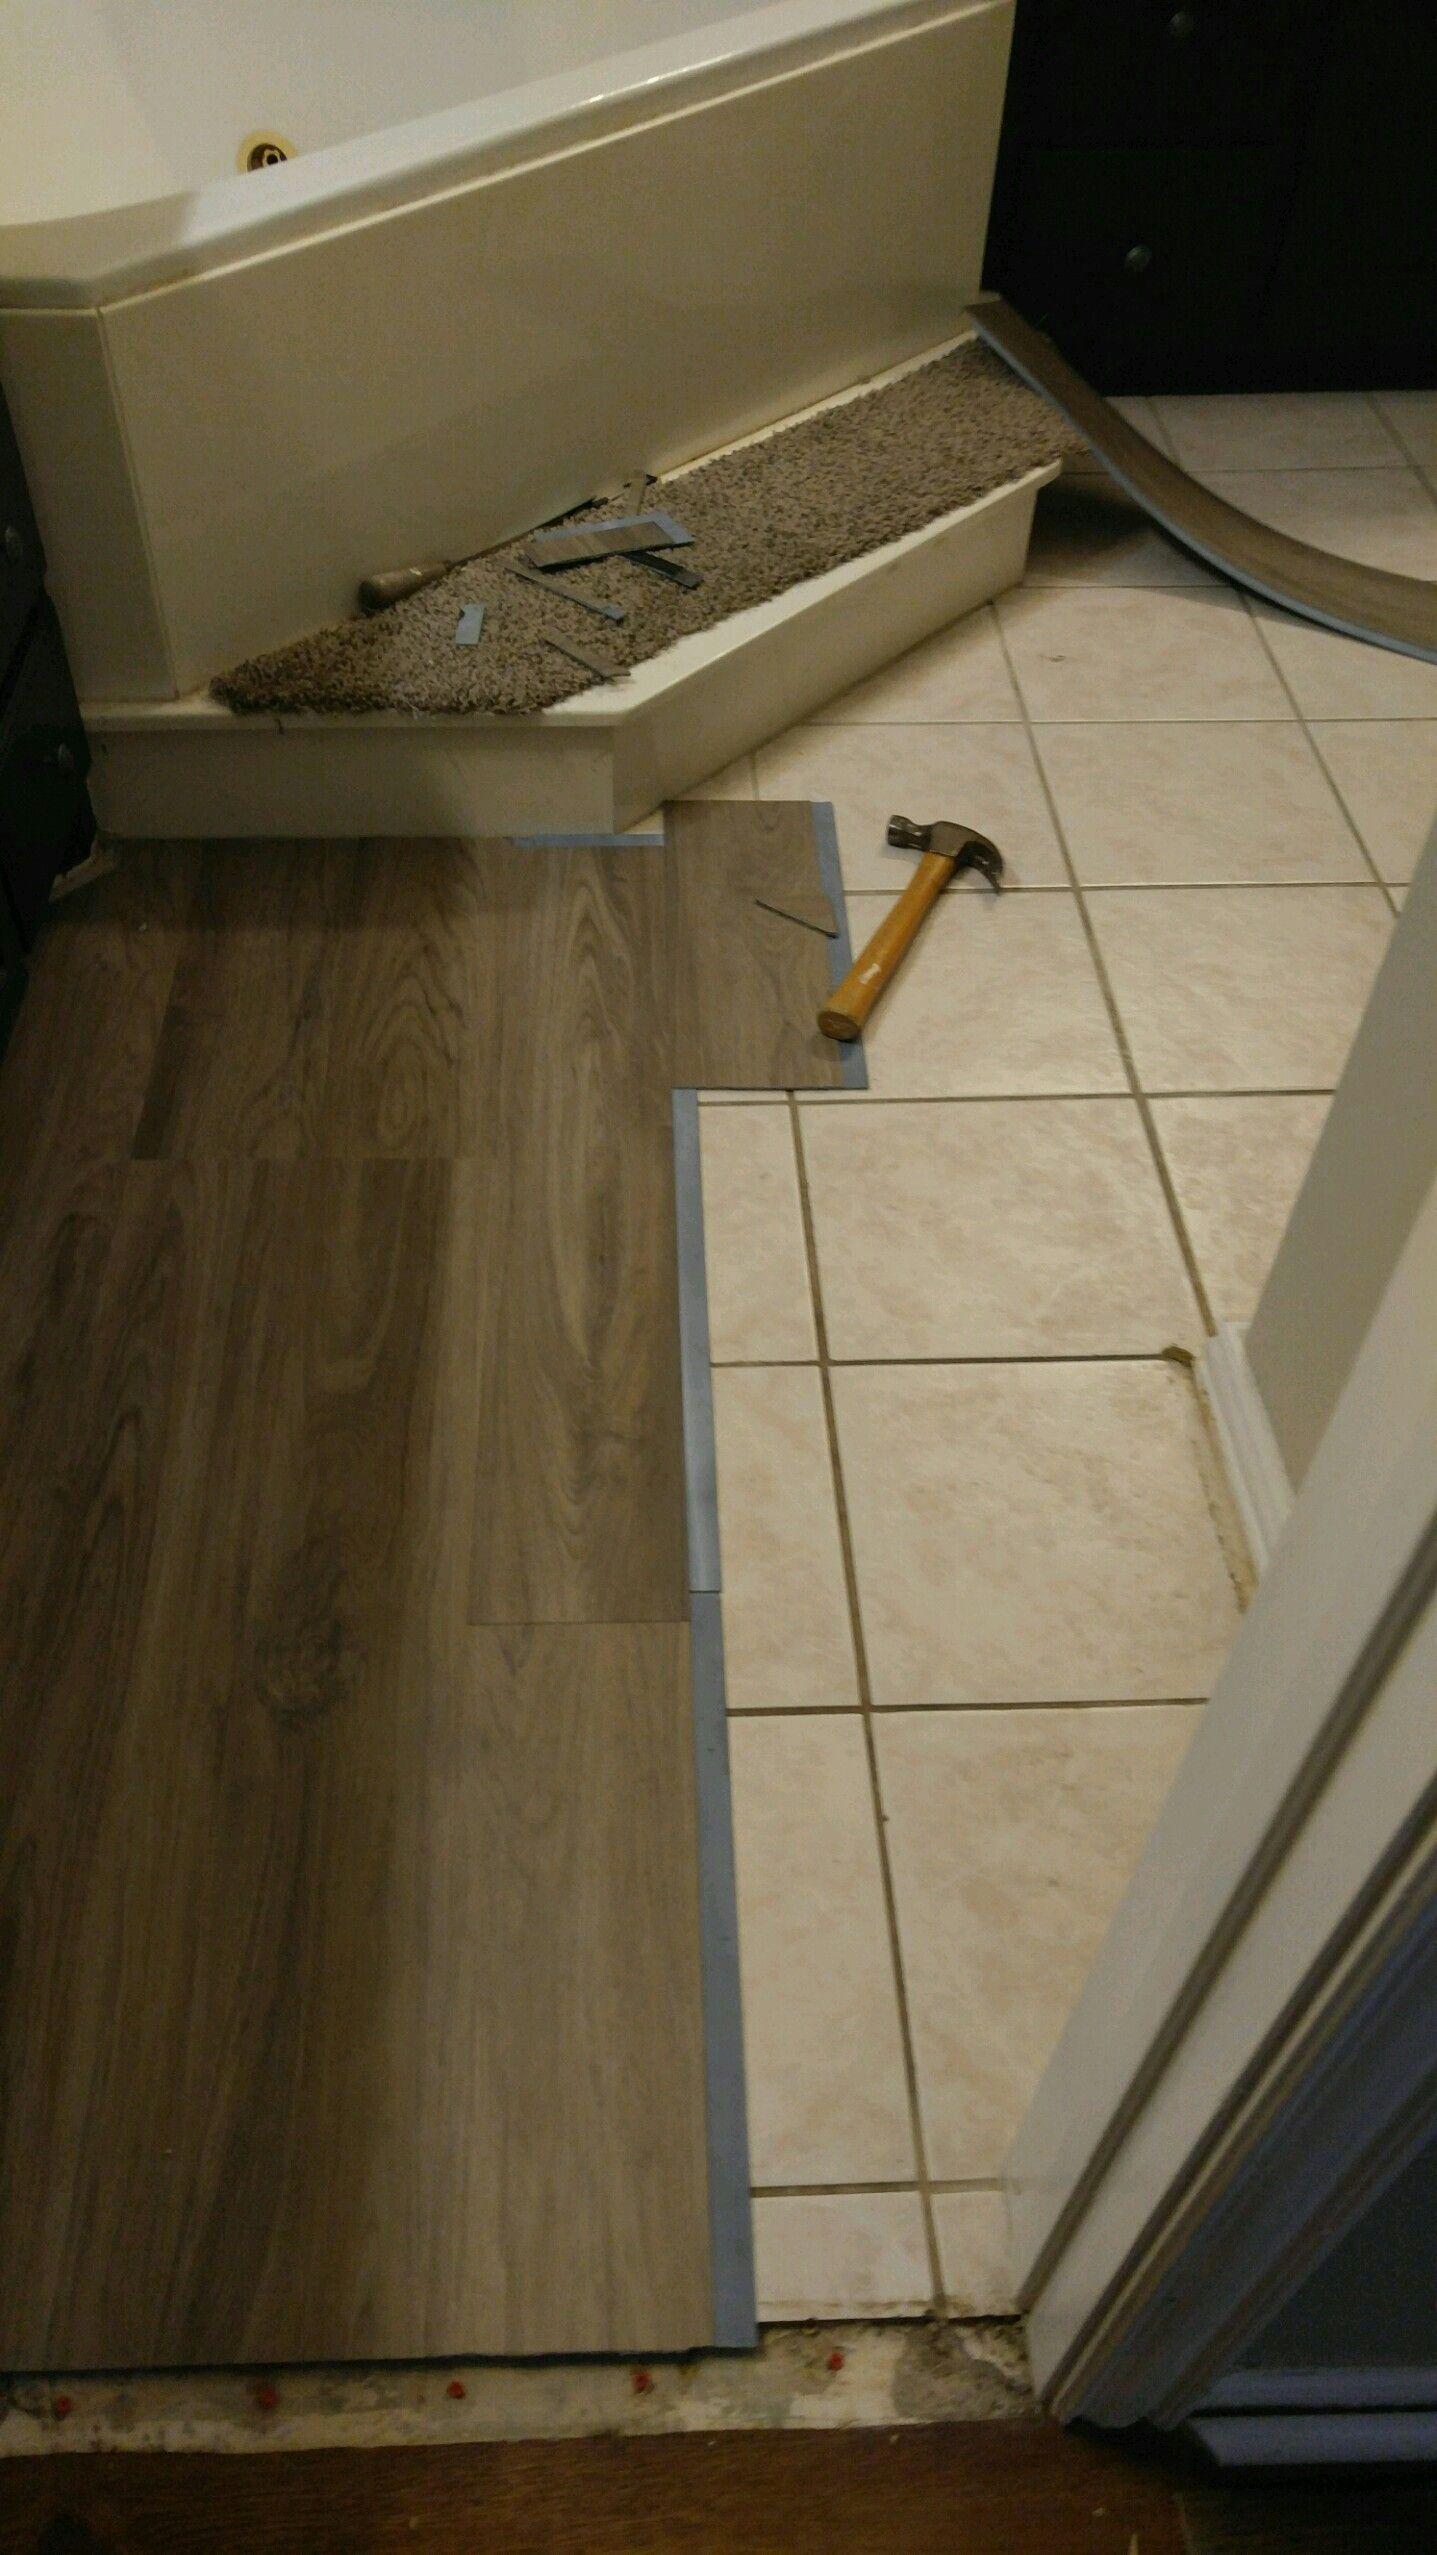 Vinyl Wood Flooring Over Tile, Laminate Wood Flooring Over Tile